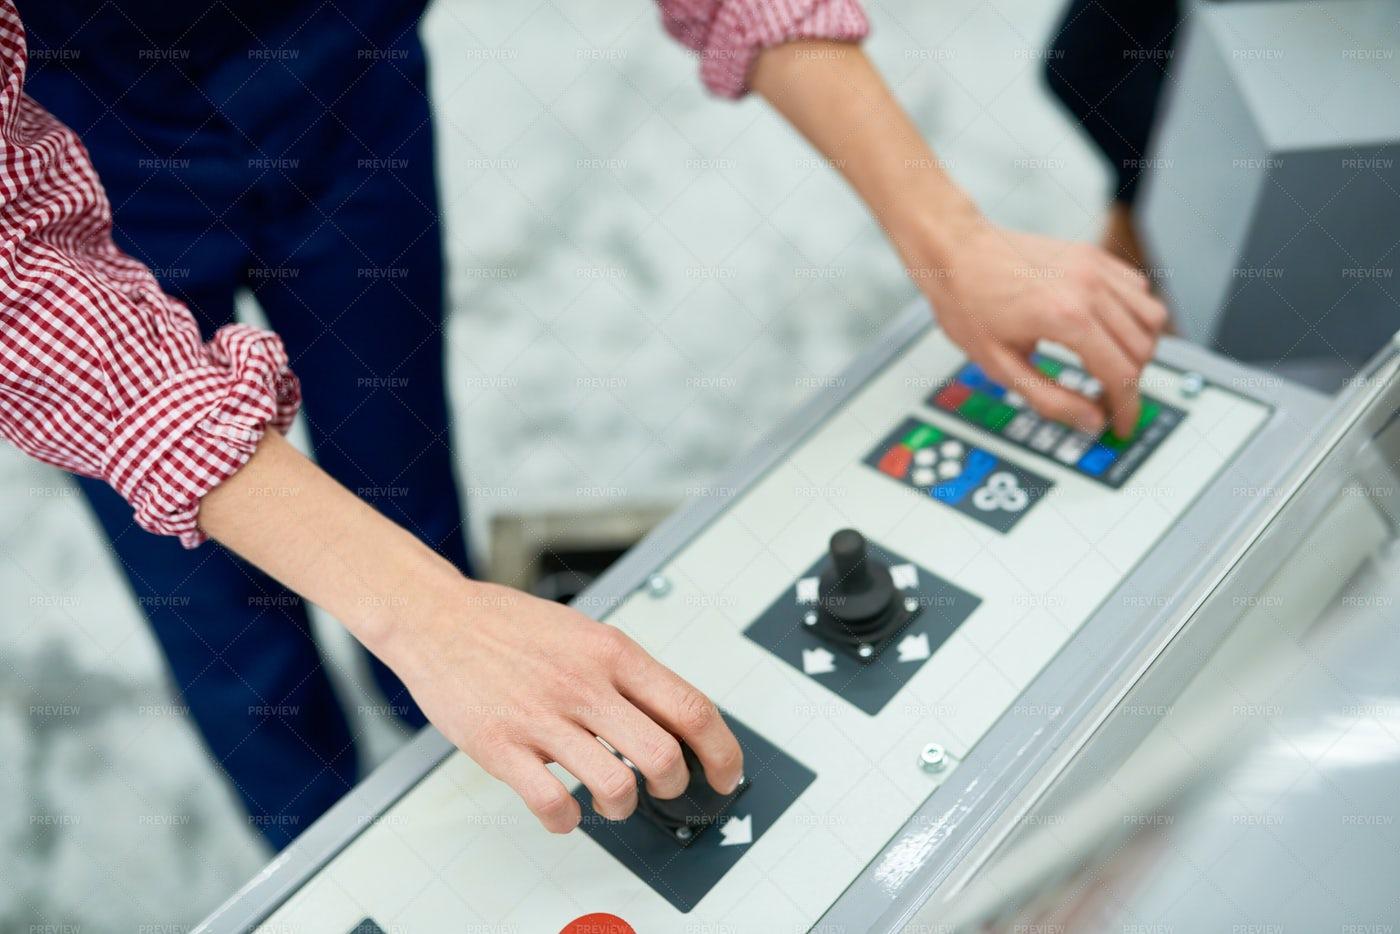 Woman Operating Machine At Factory: Stock Photos